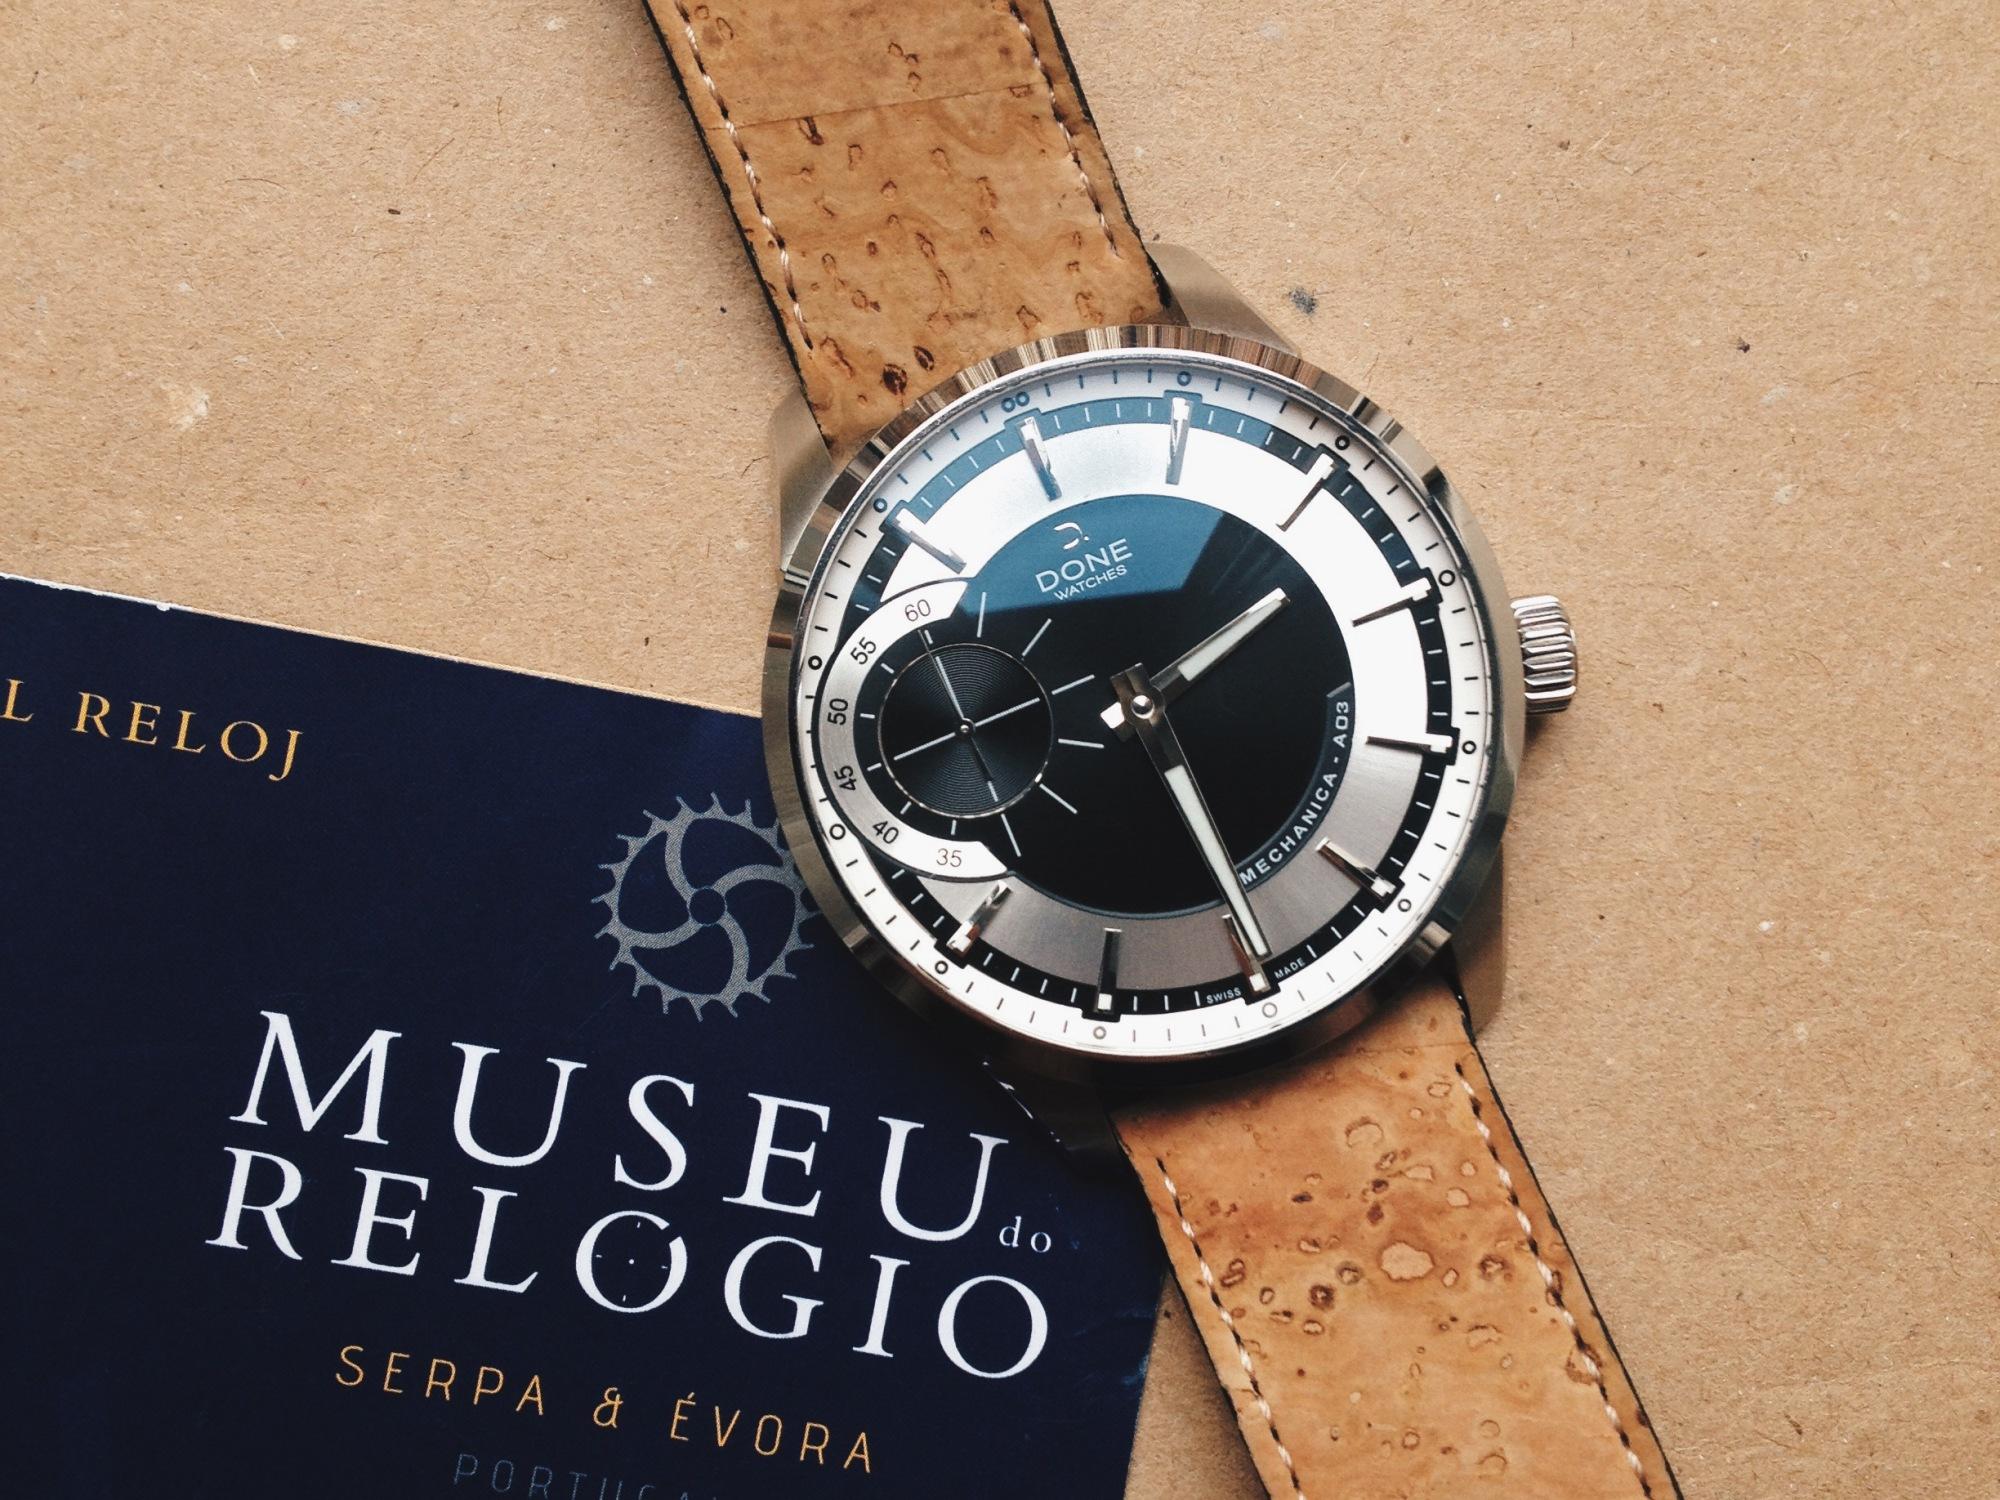 9172fbd96ca Museu do Relógio Cork watch strap (Review) + brief history ...